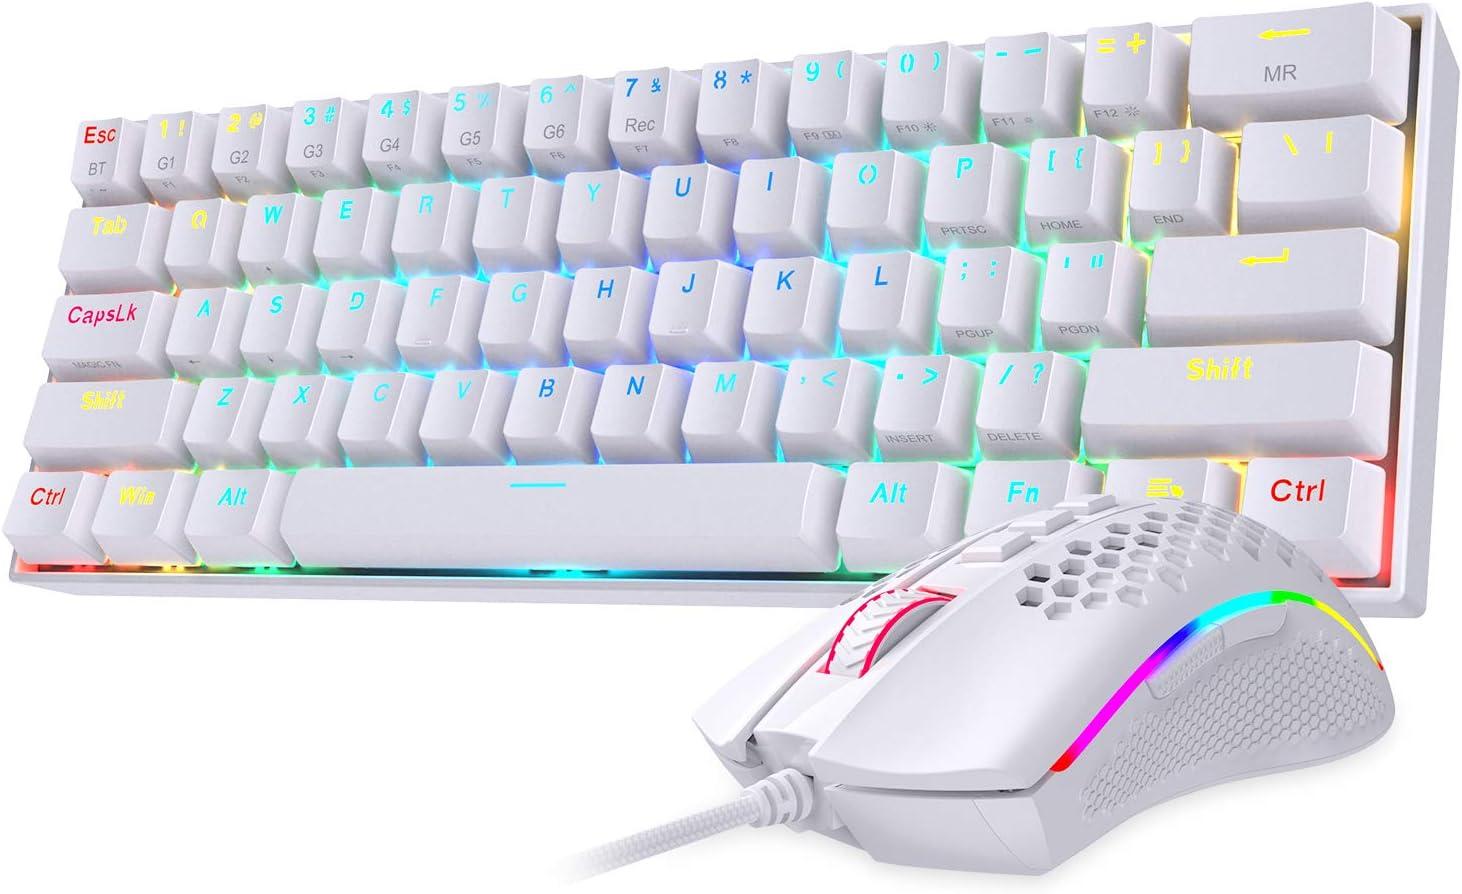 Redragon K530 RGB Mechanical Keyboard